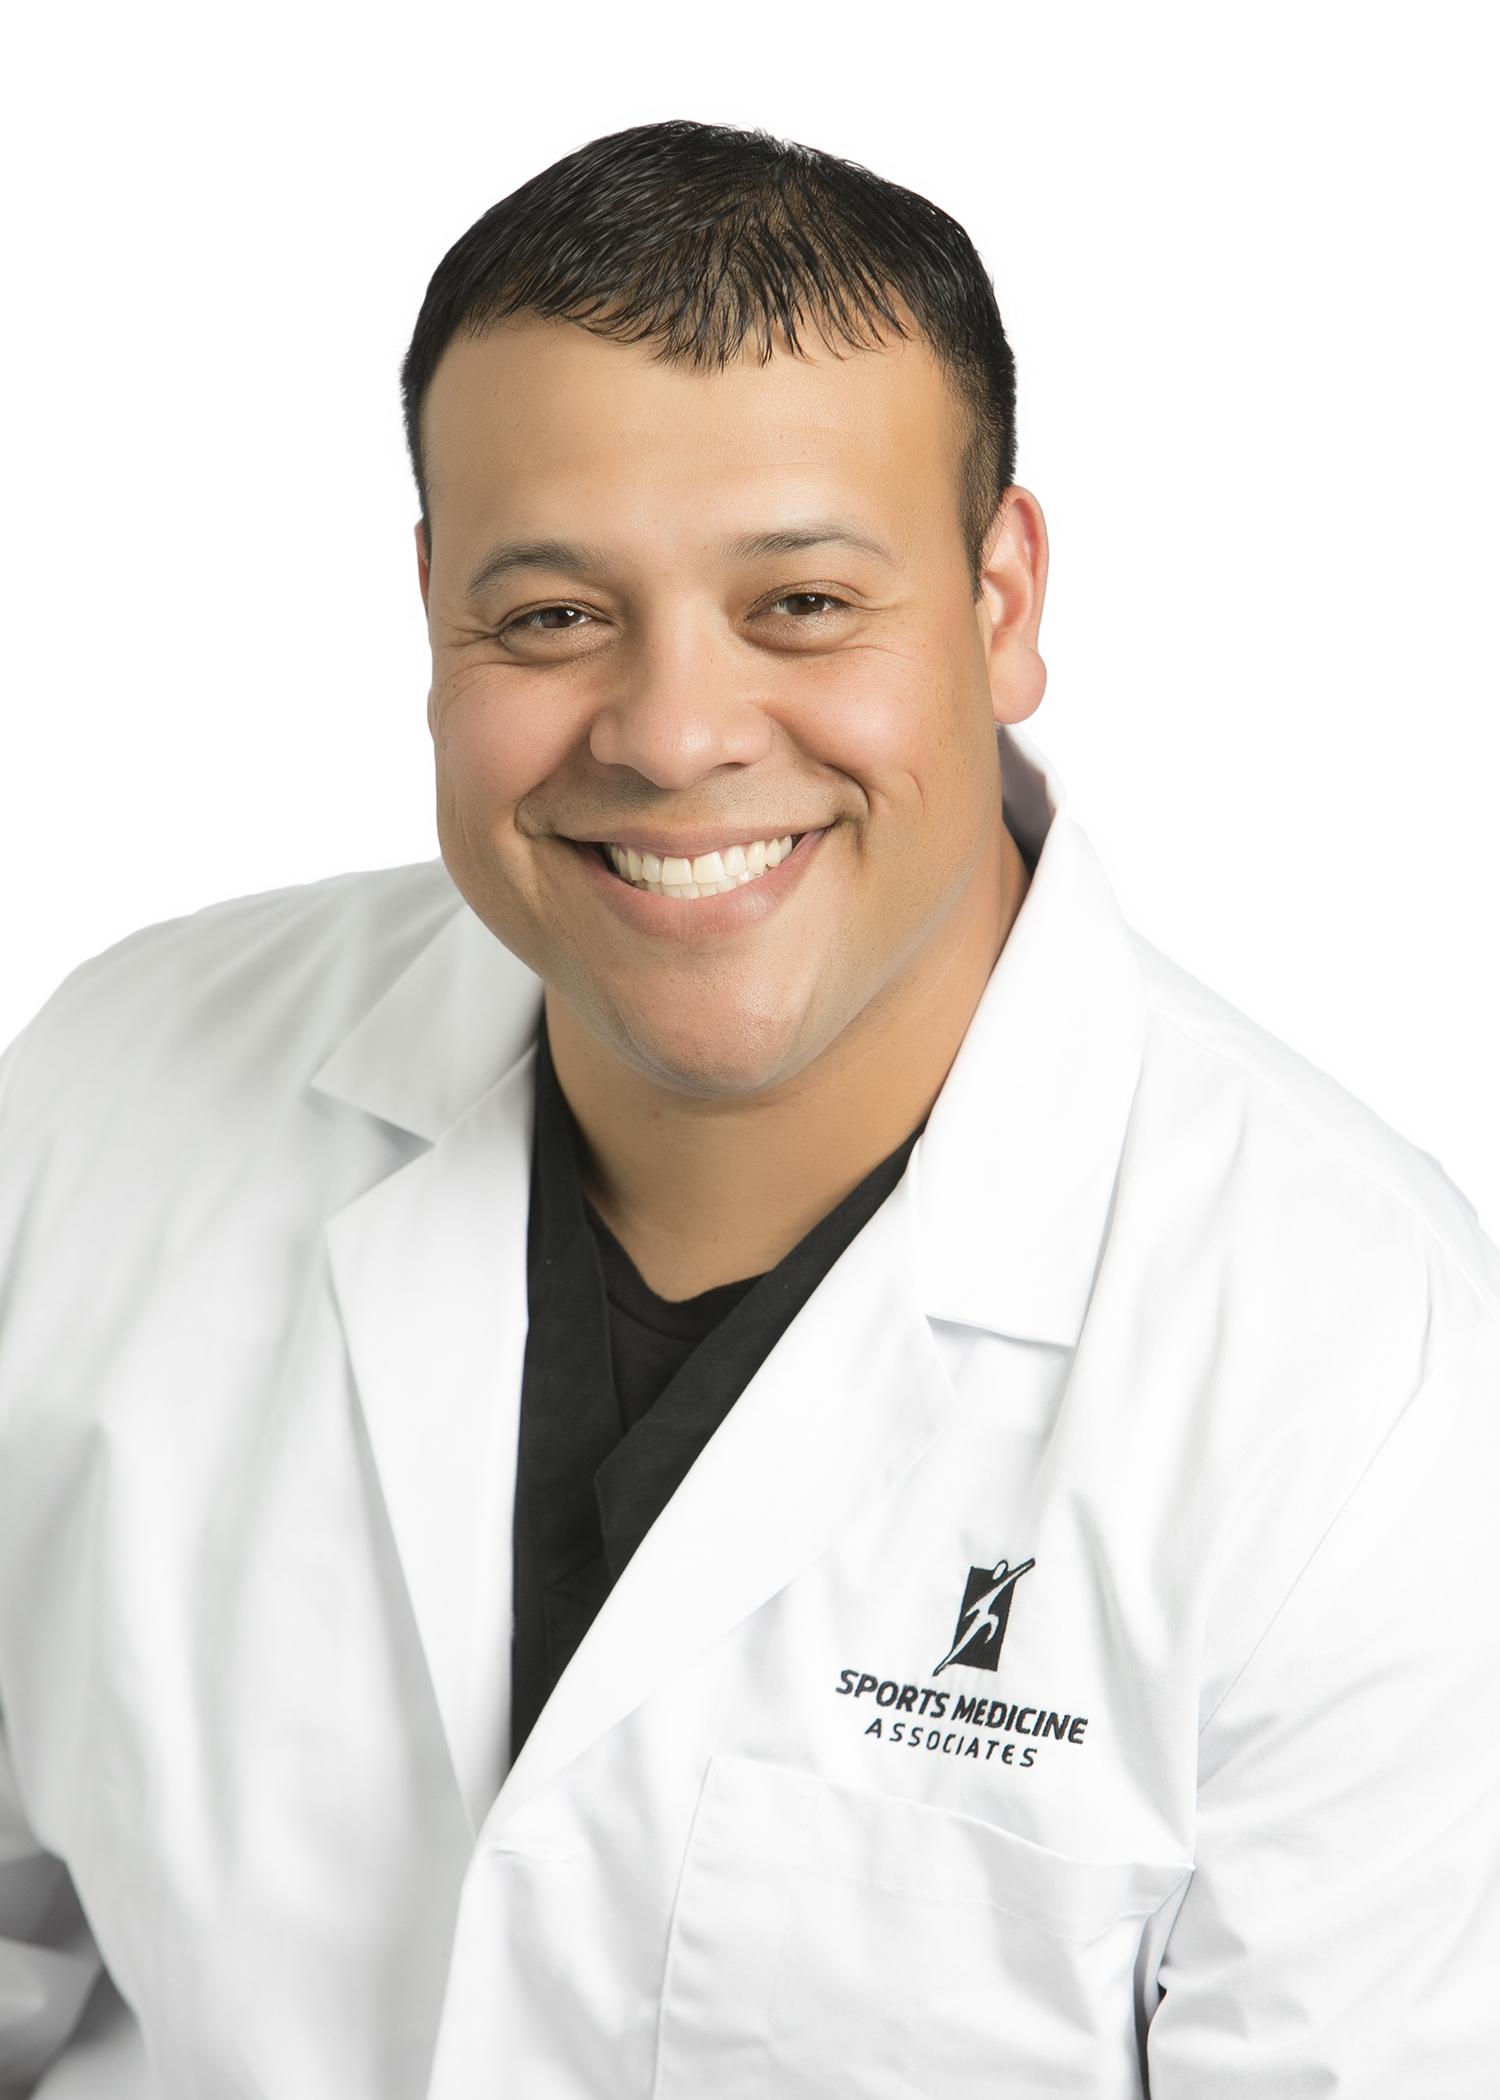 Hector U. Lopez, M.D. - Primary Care Sports Medicine